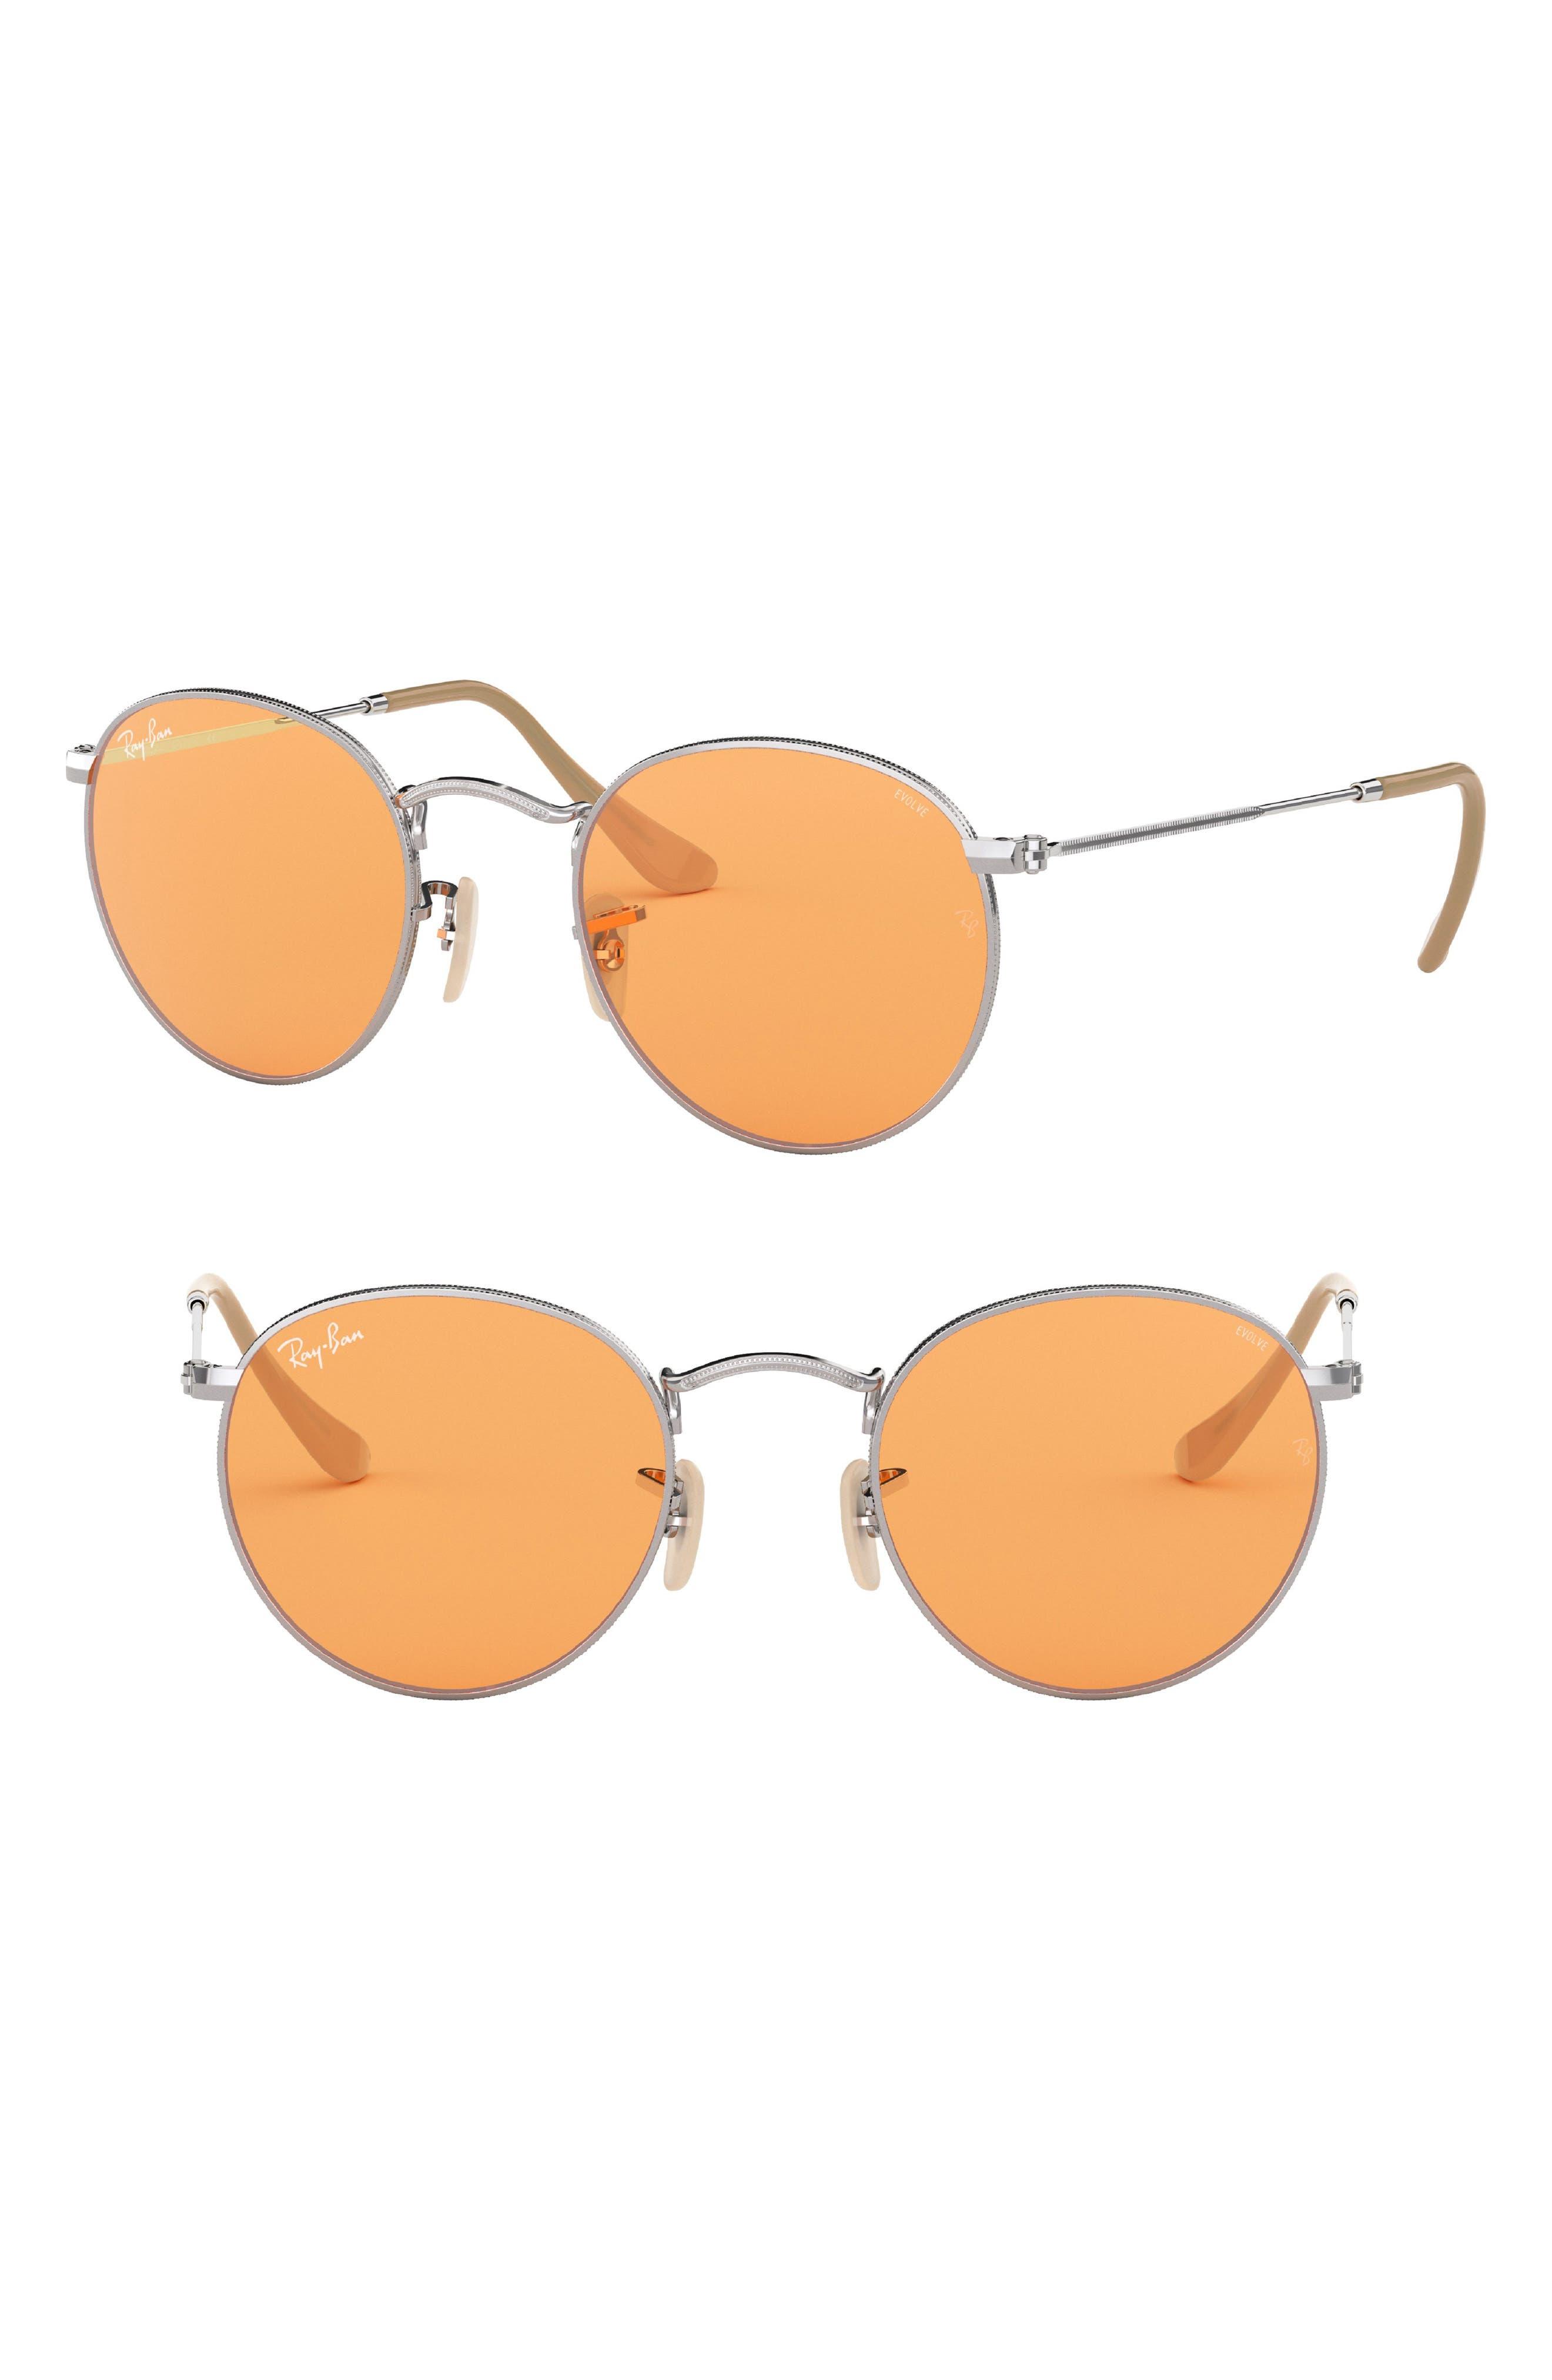 50mm Retro Inspired Round Metal Sunglasses,                             Main thumbnail 1, color,                             043